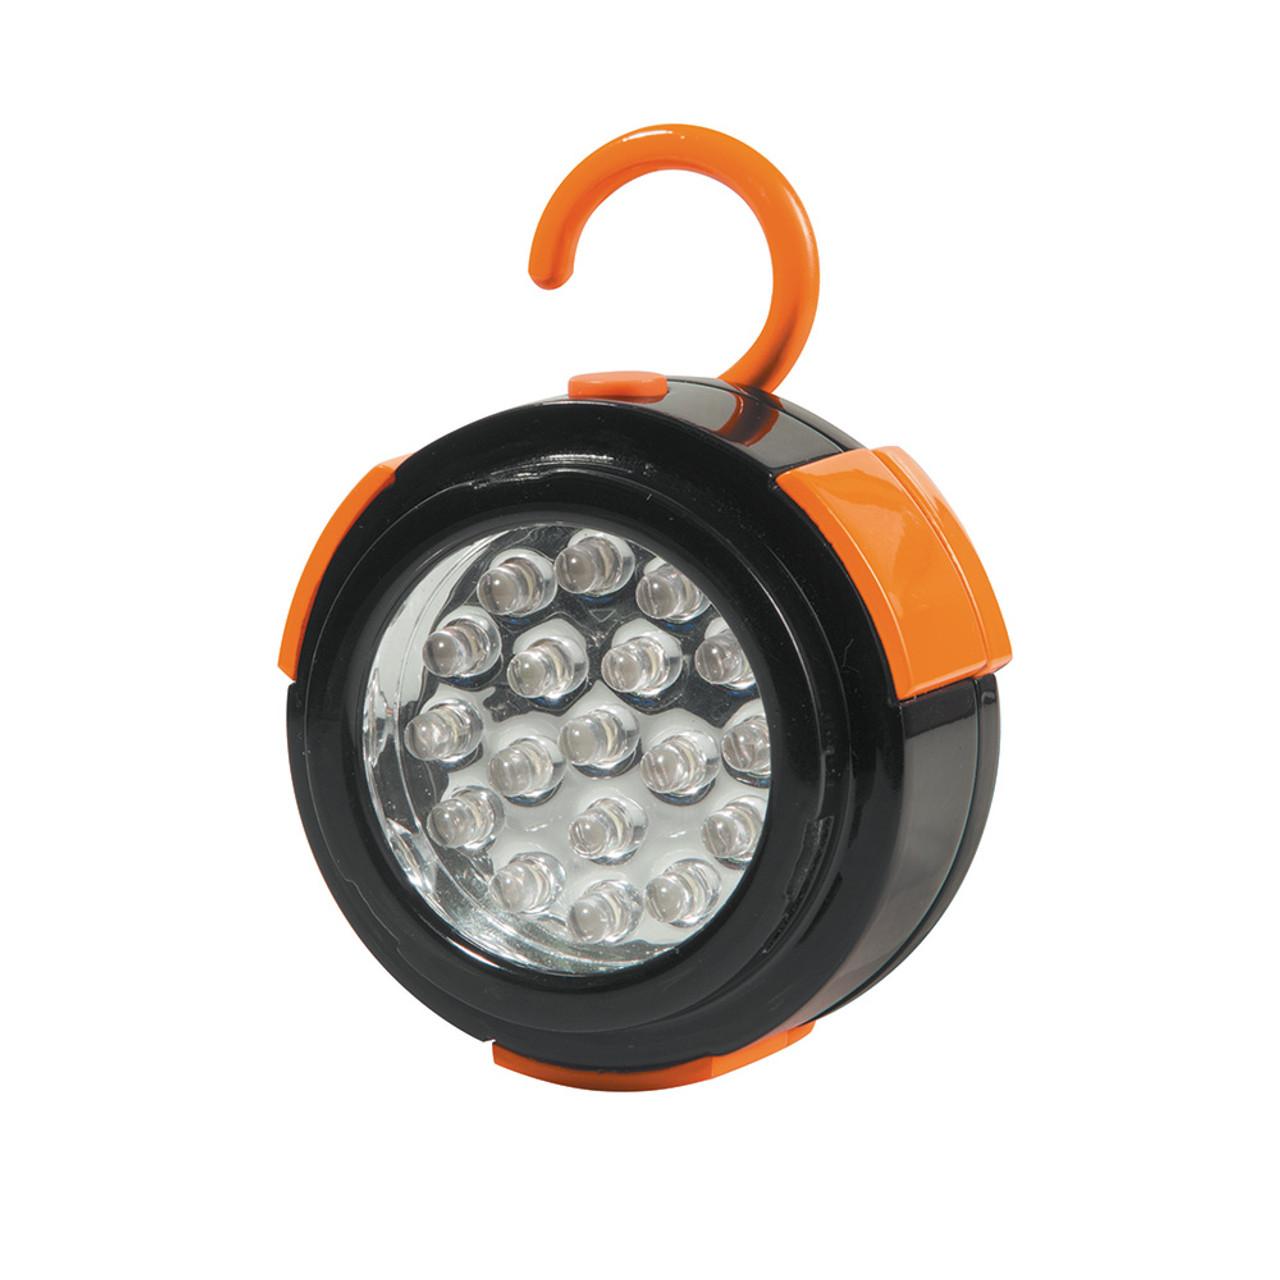 Klein 55437 Tradesman Pro Work Light